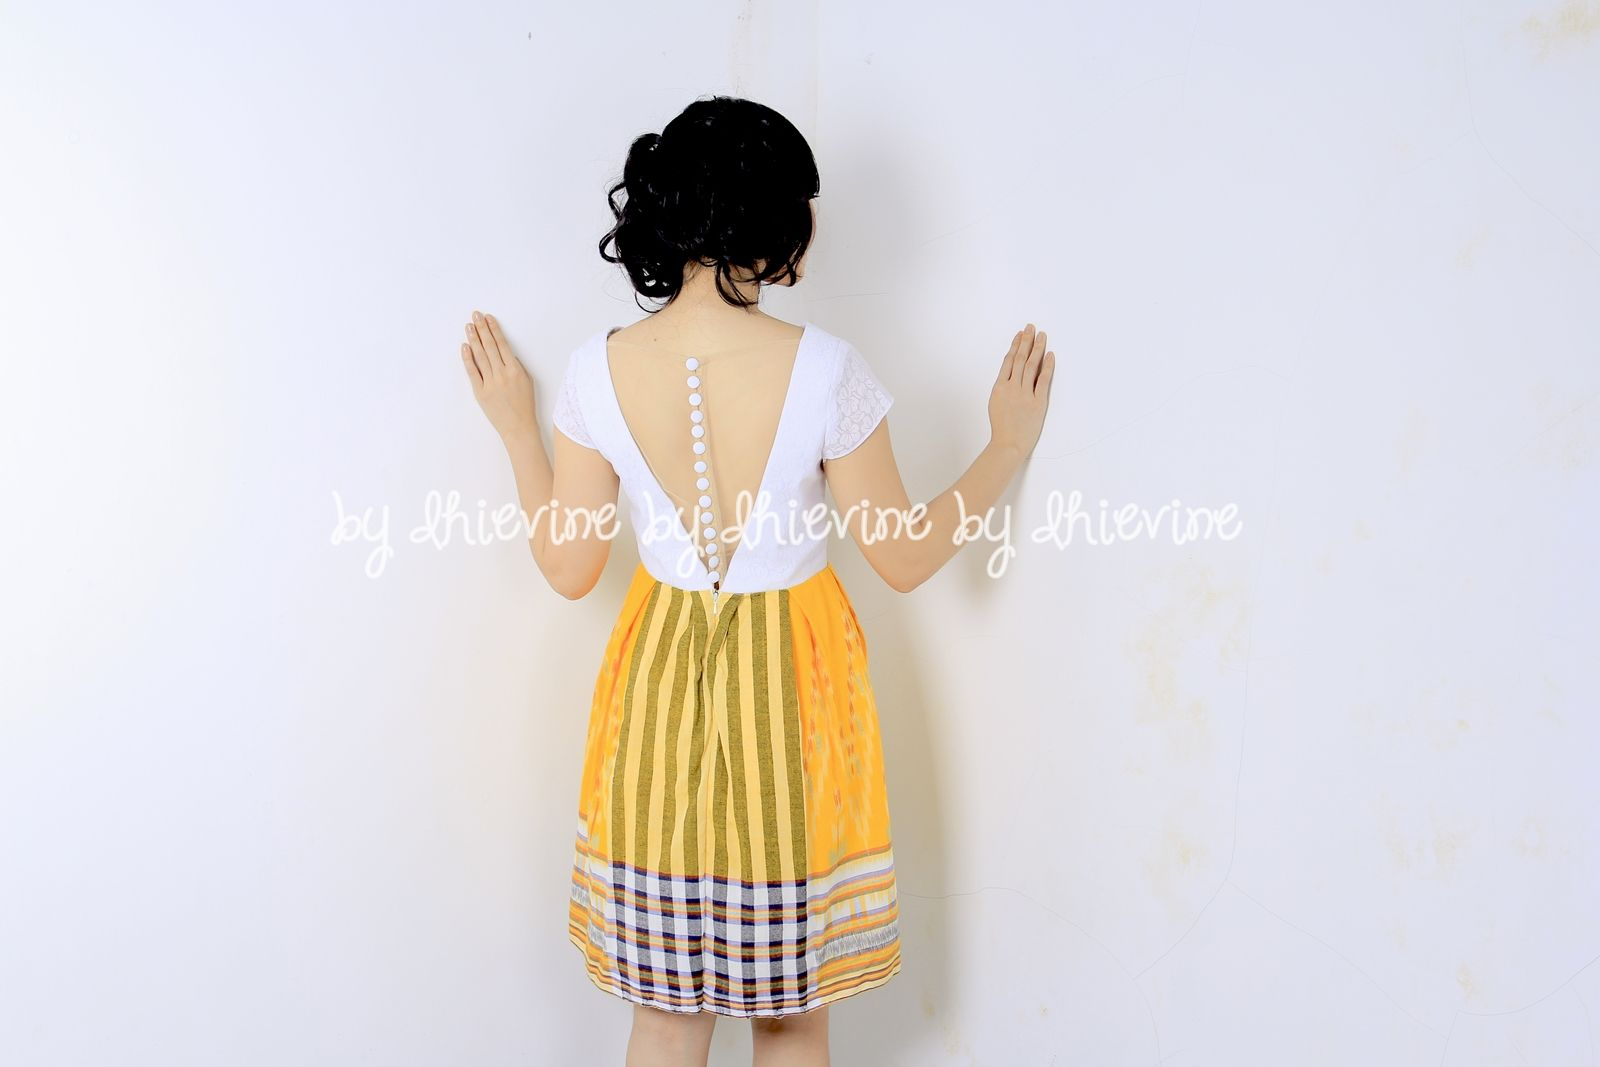 Awahita Ikat Yellow Dress | DhieVine | Redefine You